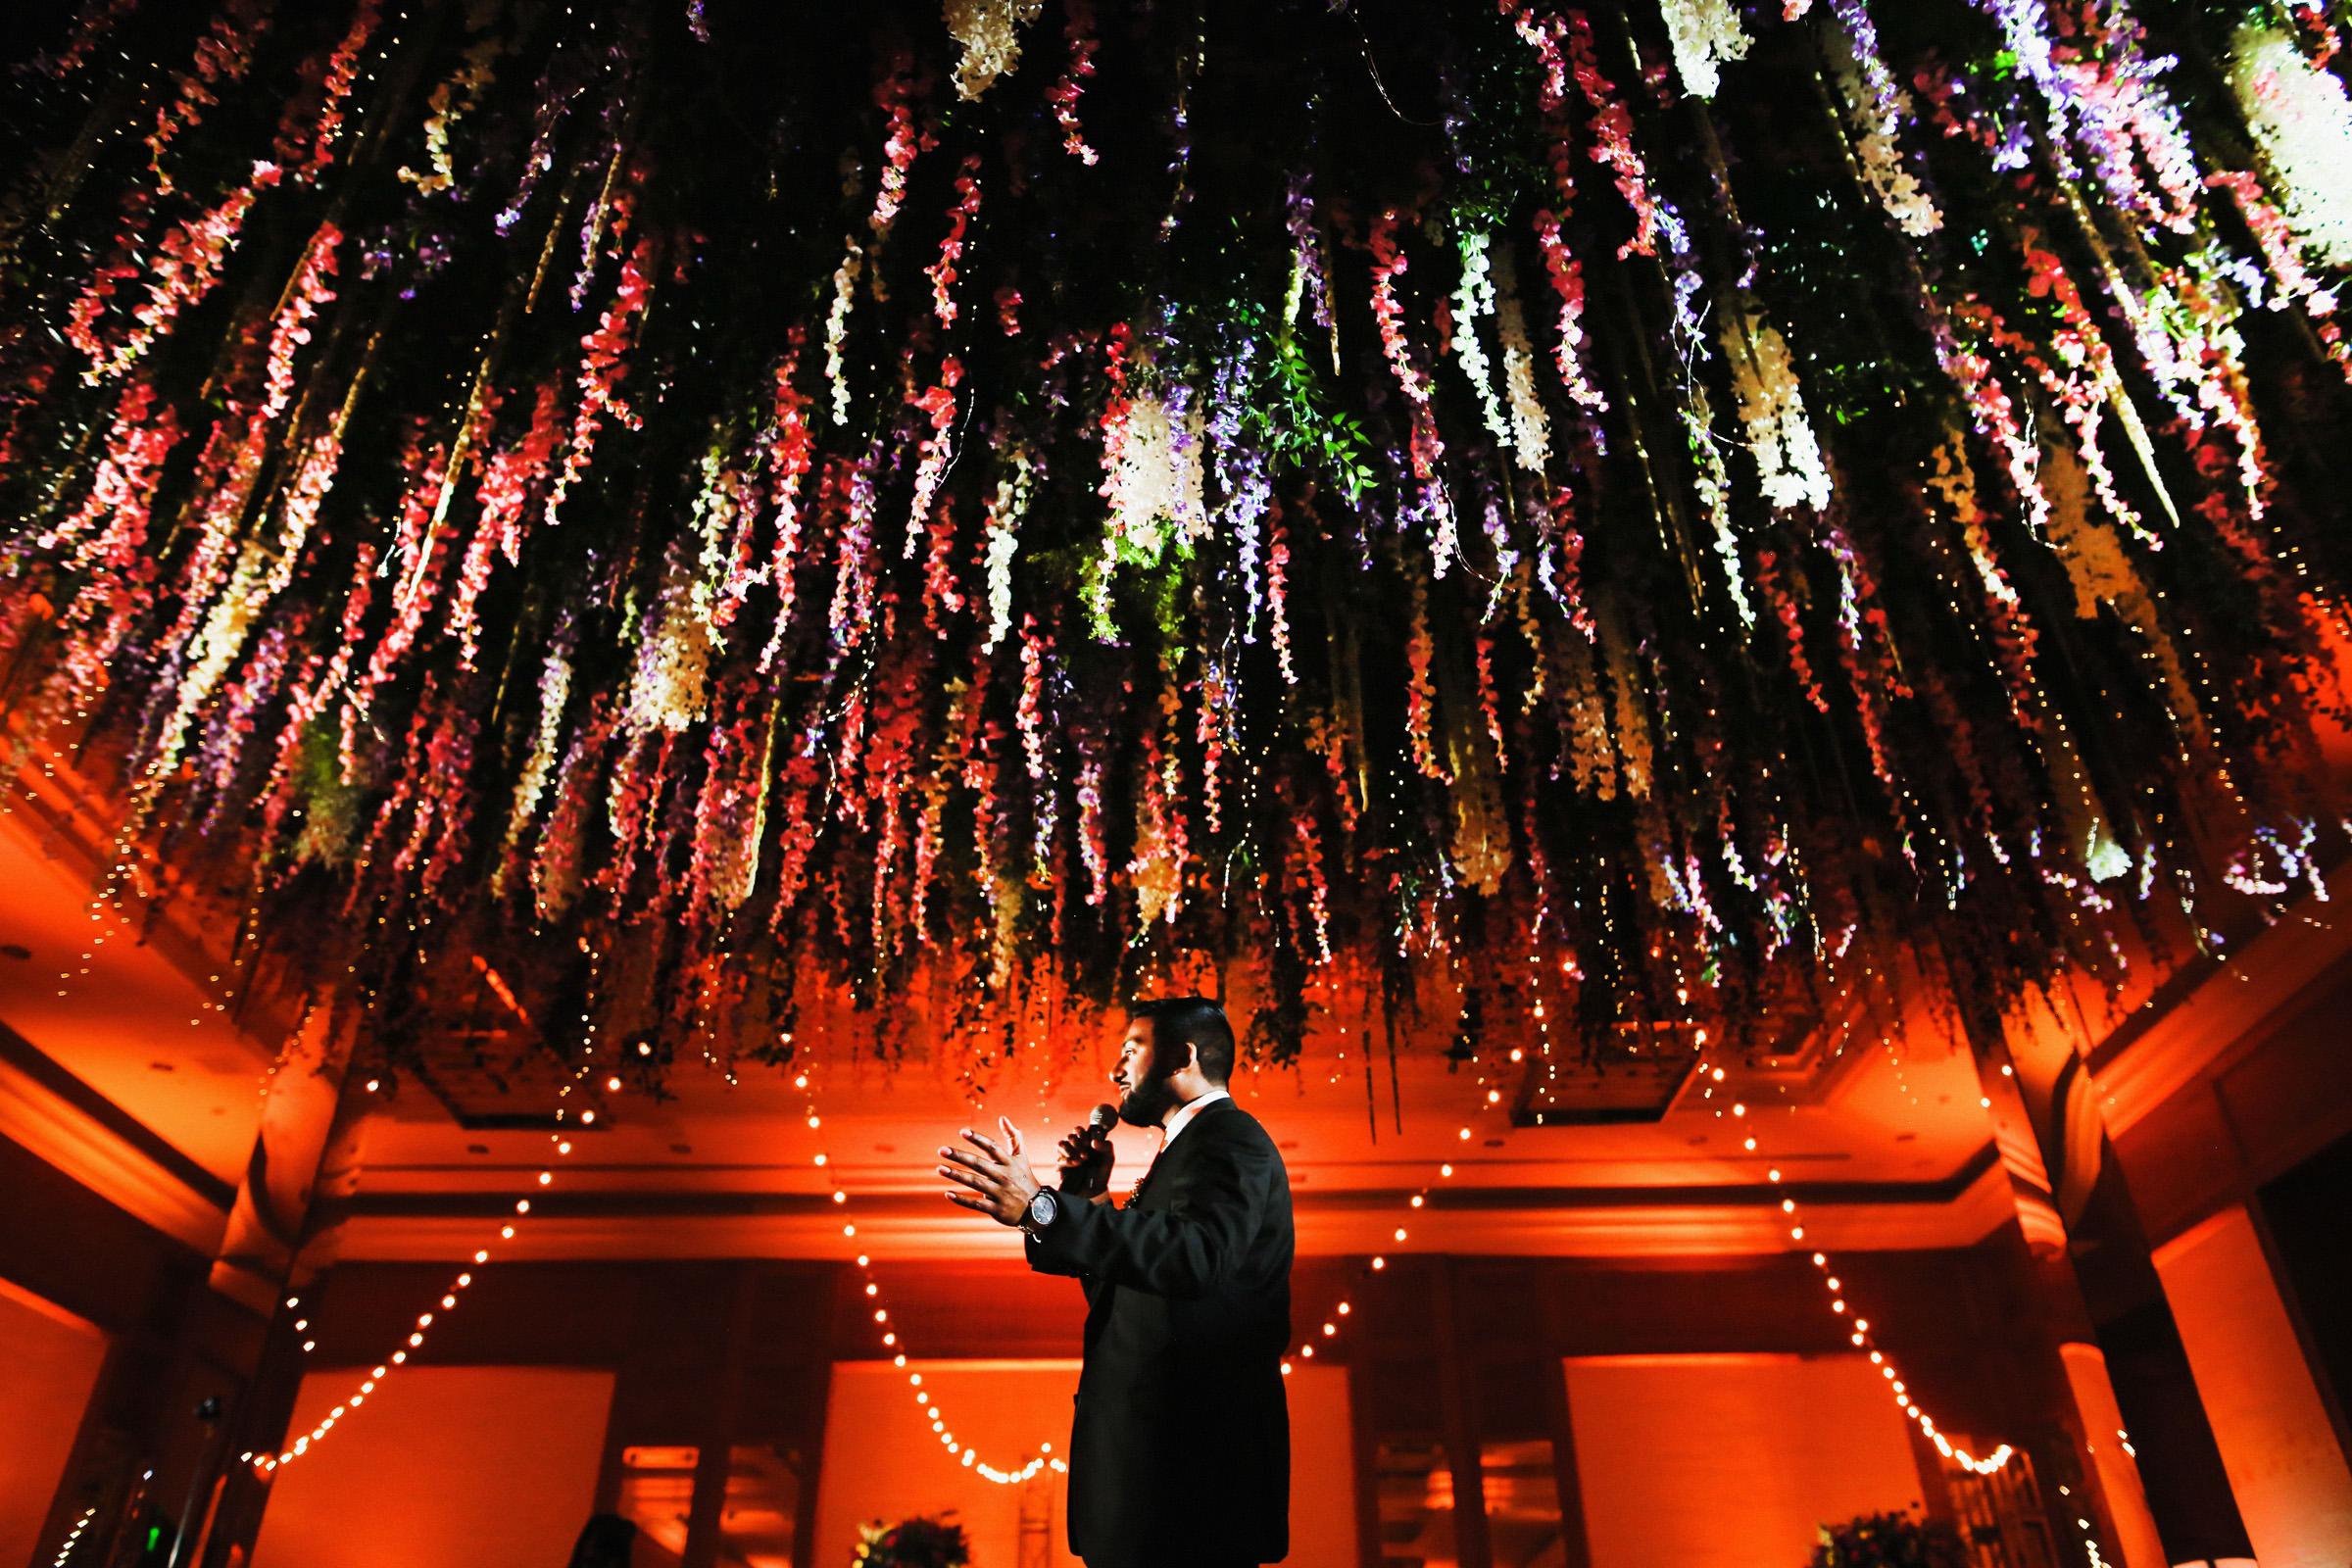 Best man toast under elaborate ceiling floral decor by Franck Boutonnet